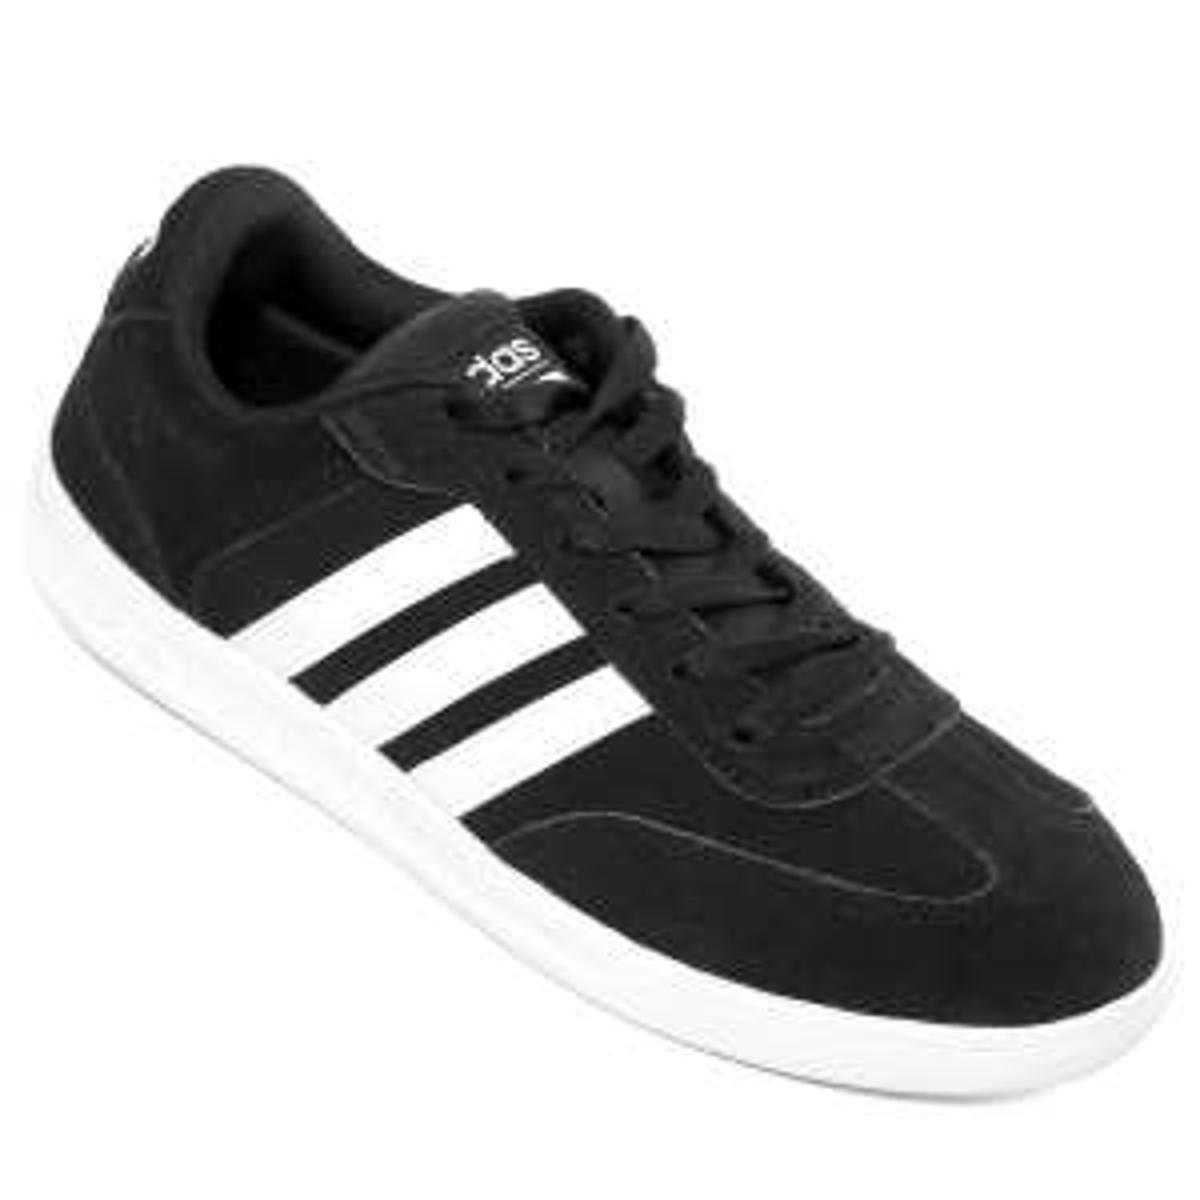 Netshoes: Tenis Adidas Neo Cross Court Talla 27.5 Mx